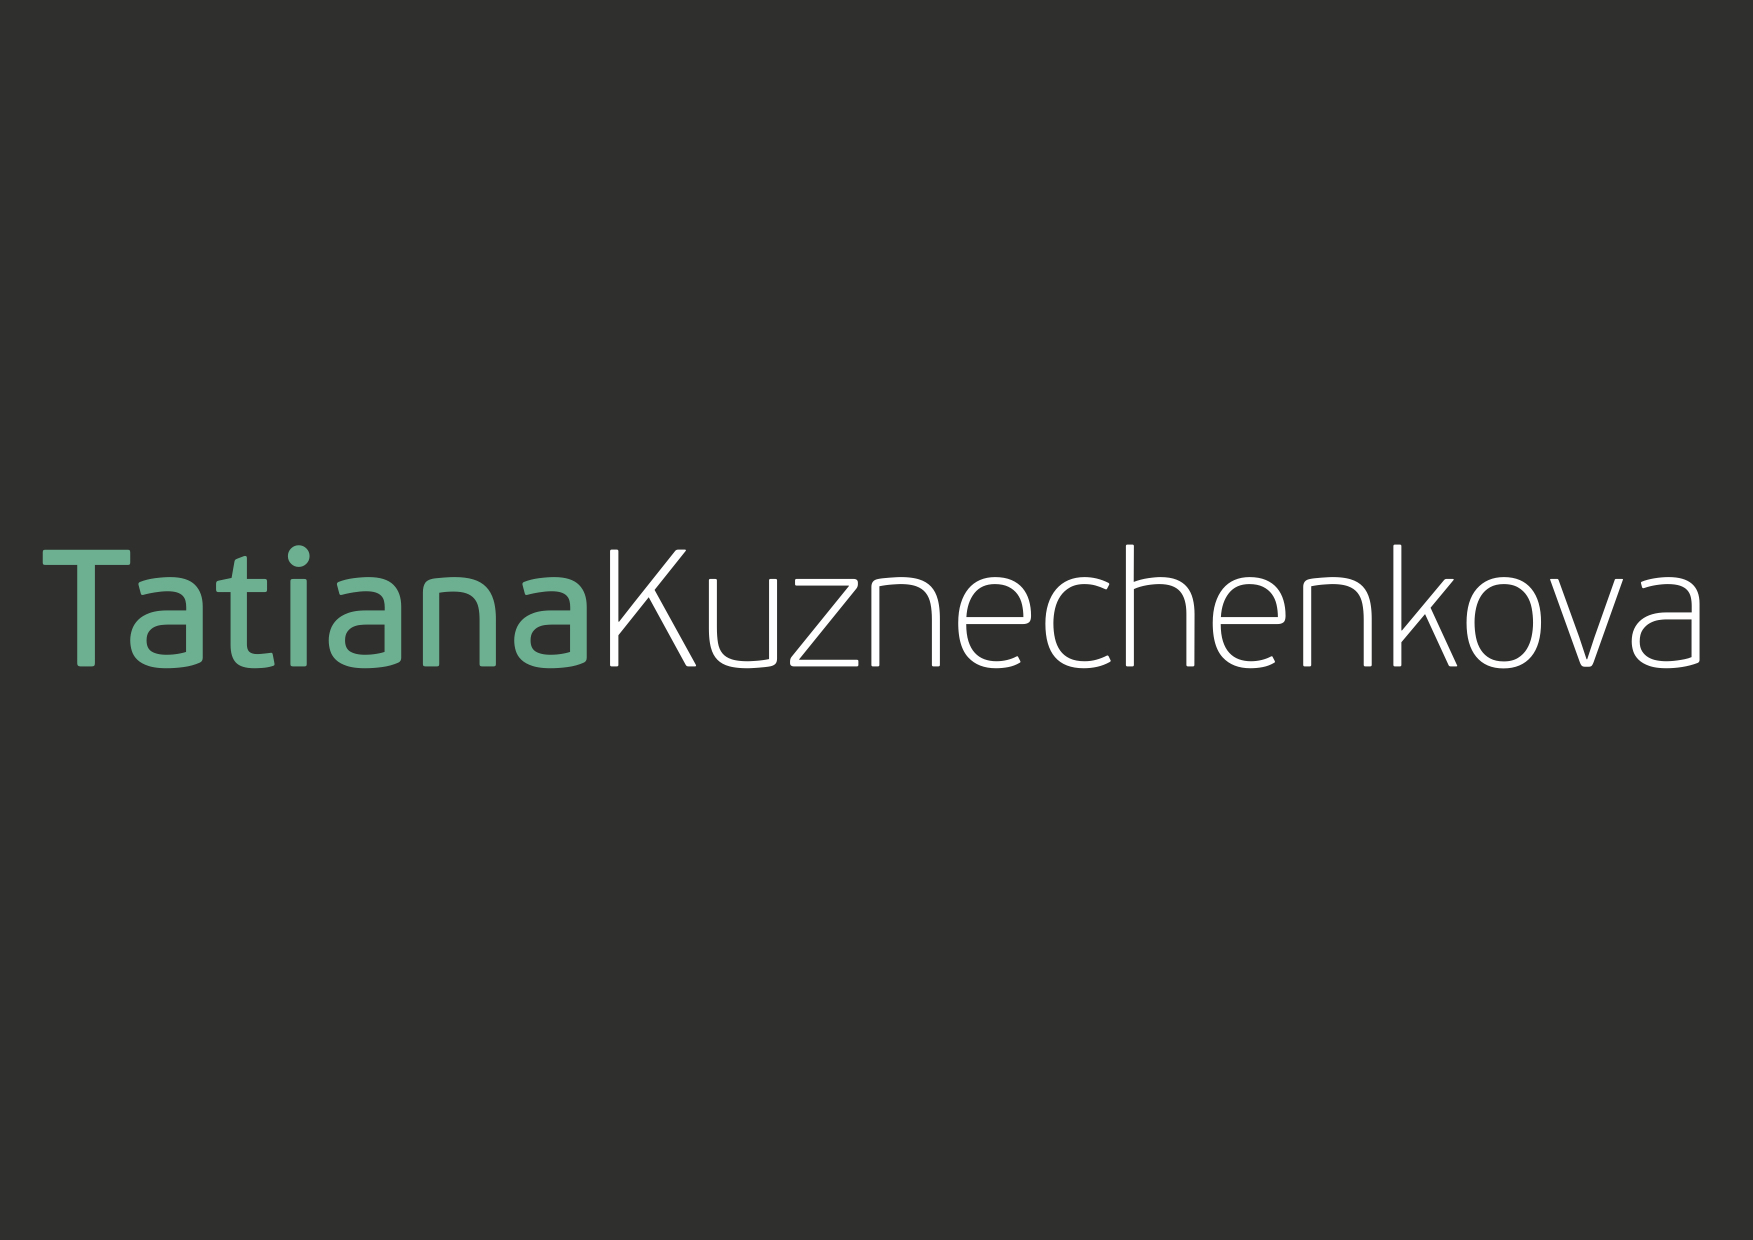 Tatiana-Kuznechenkova-Logo-02-Black